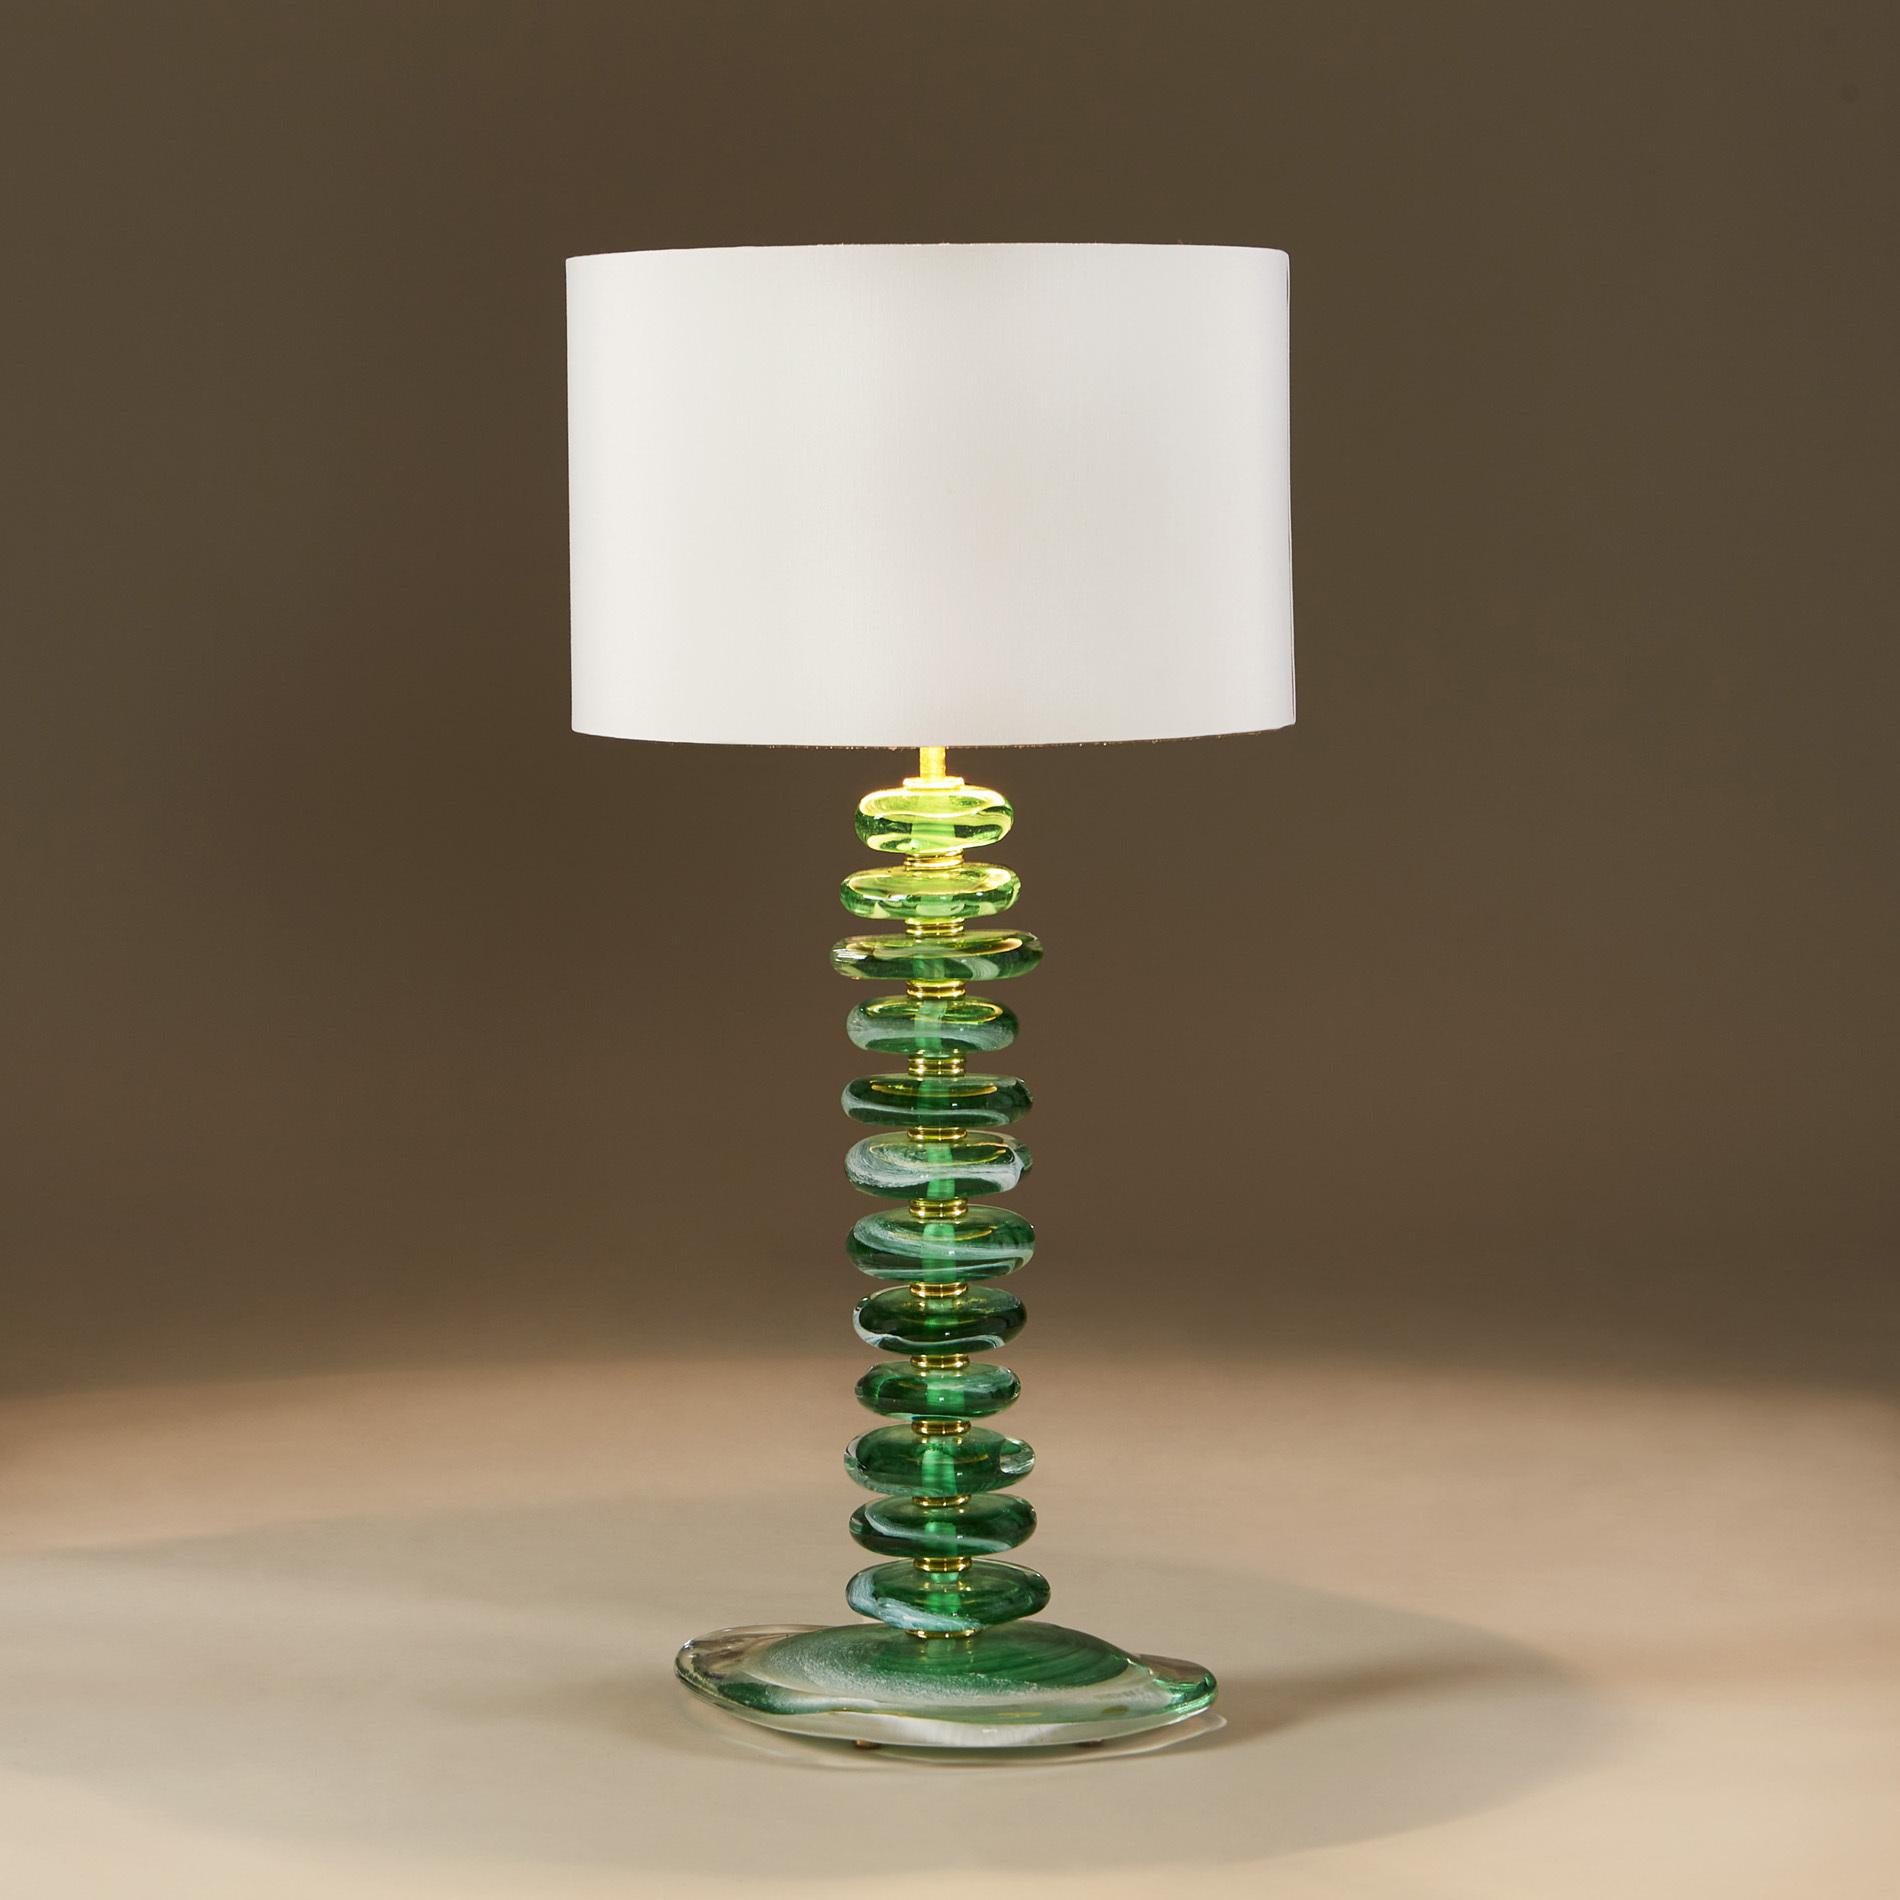 Green Glass Pebble Lamp 0023 V1